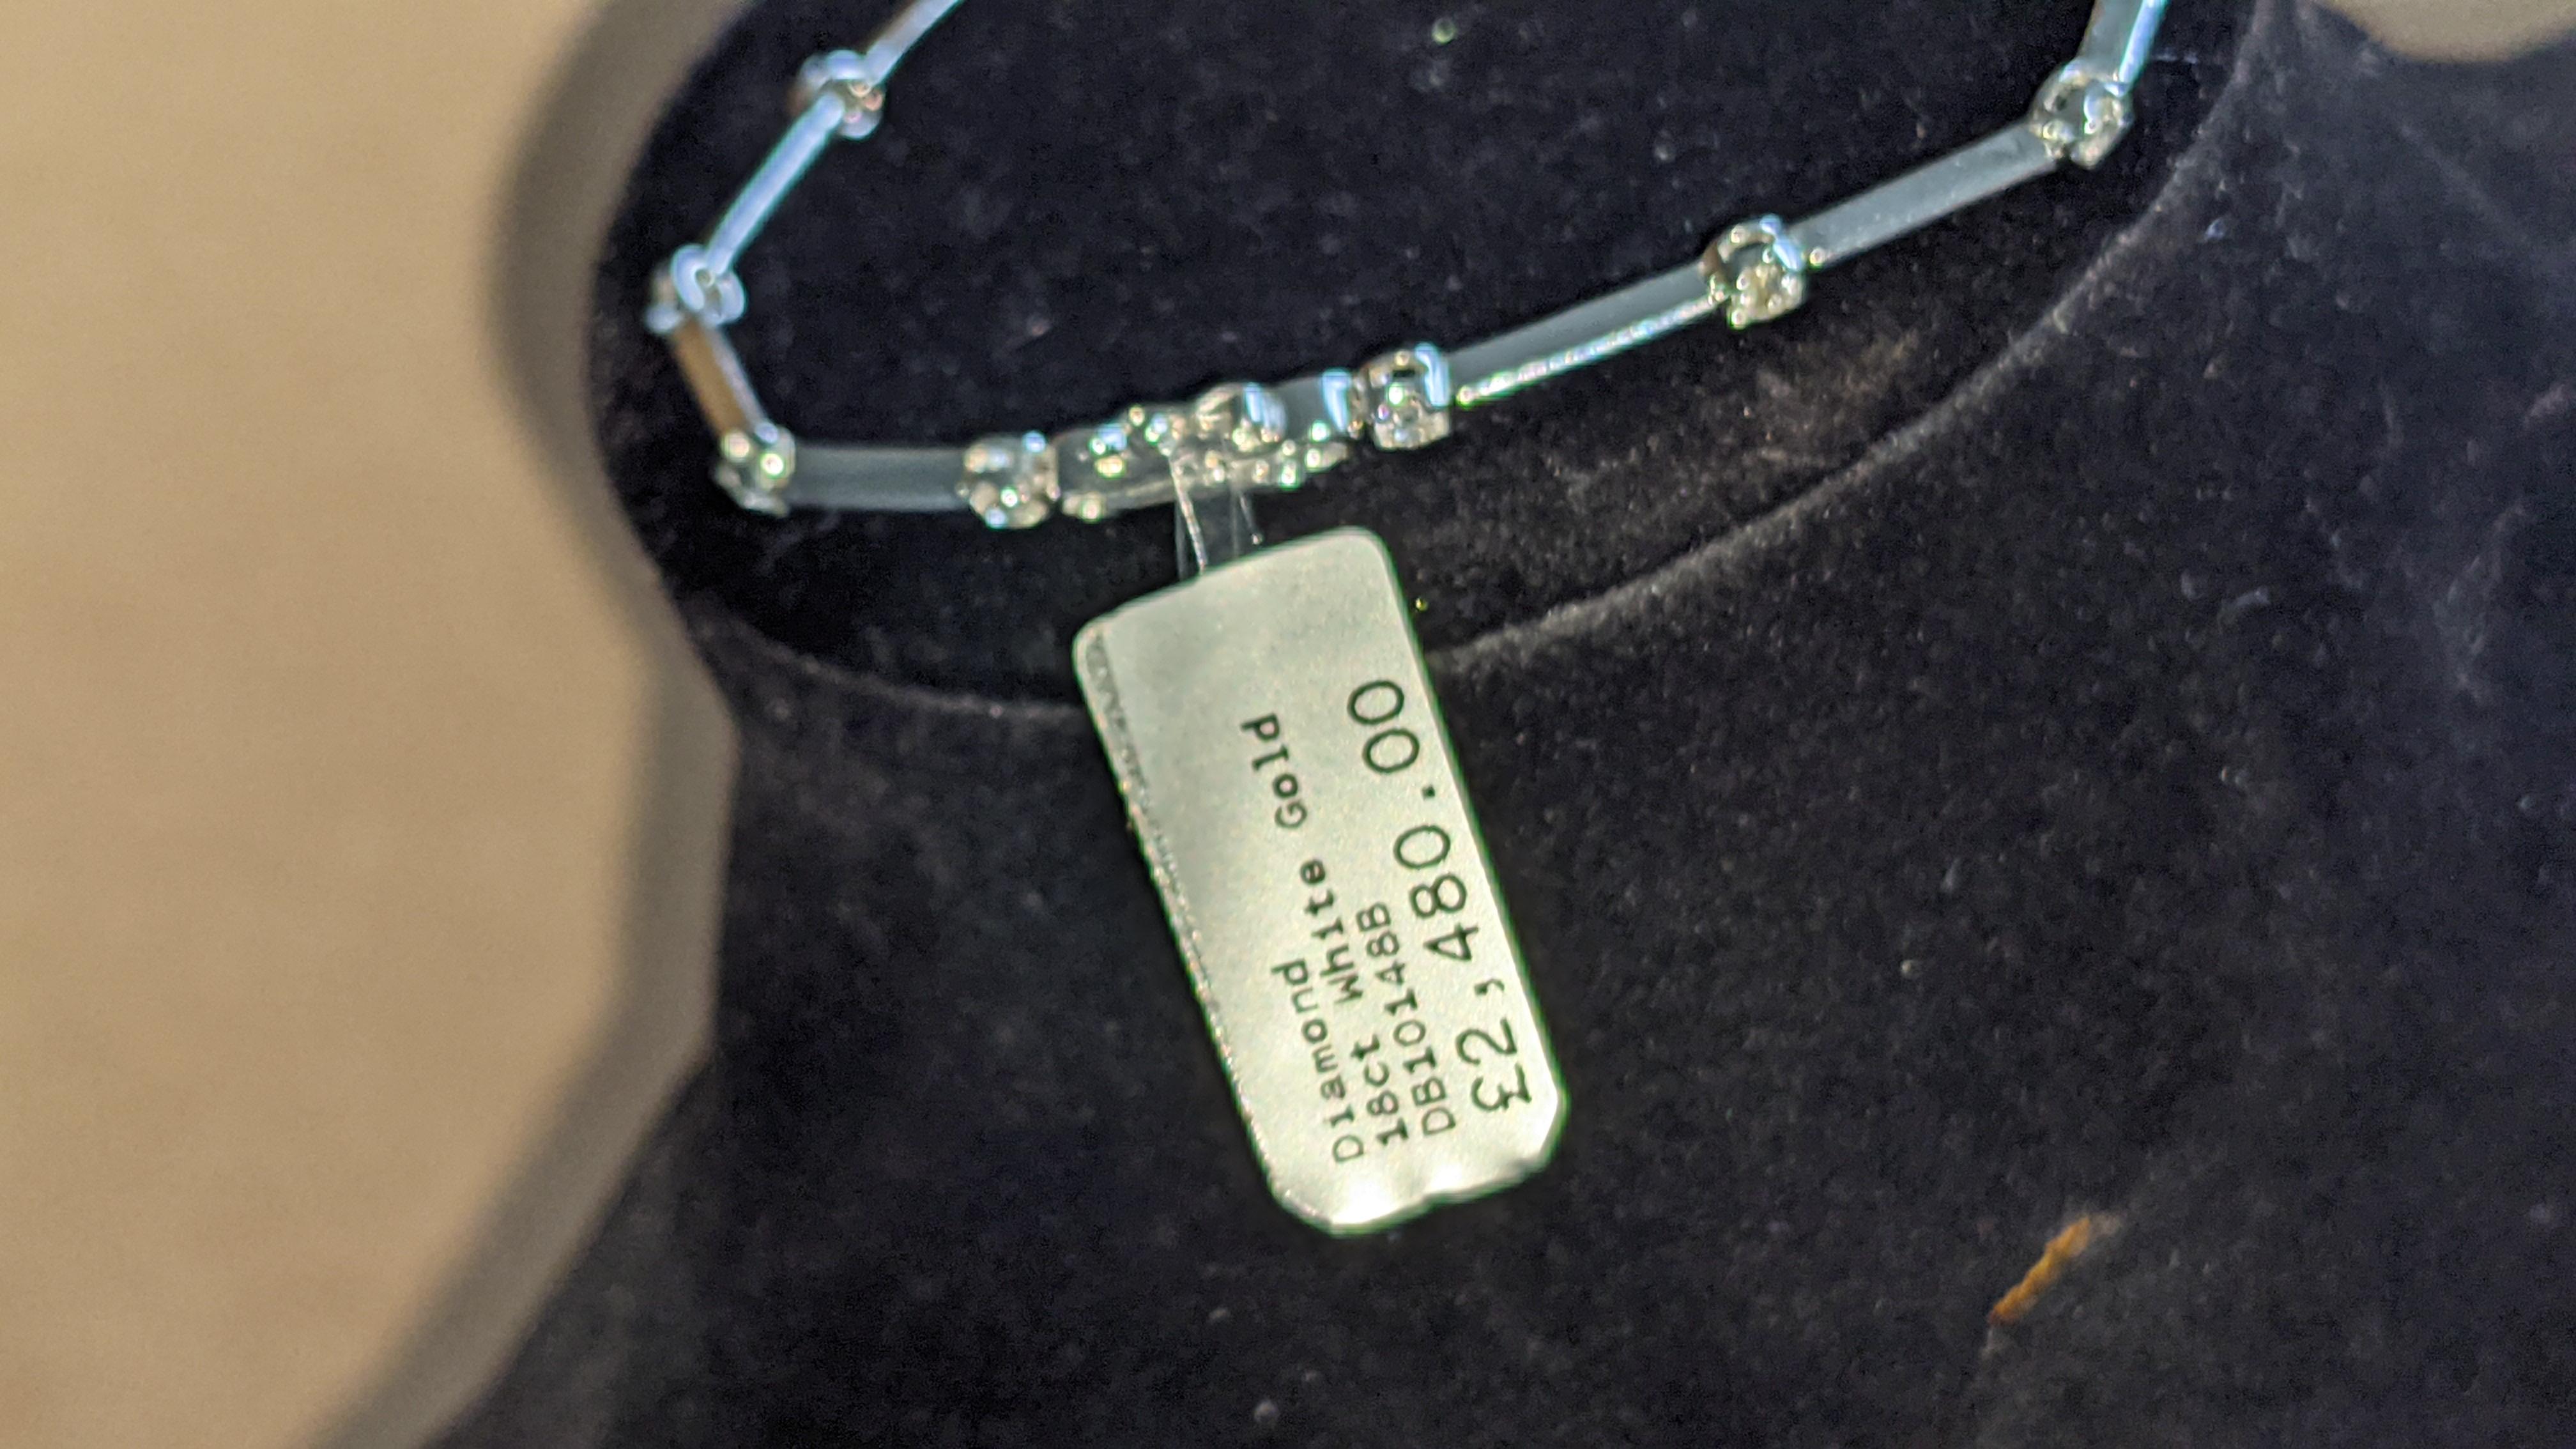 18ct white gold & diamond bracelet RRP £2,480 - Image 3 of 9